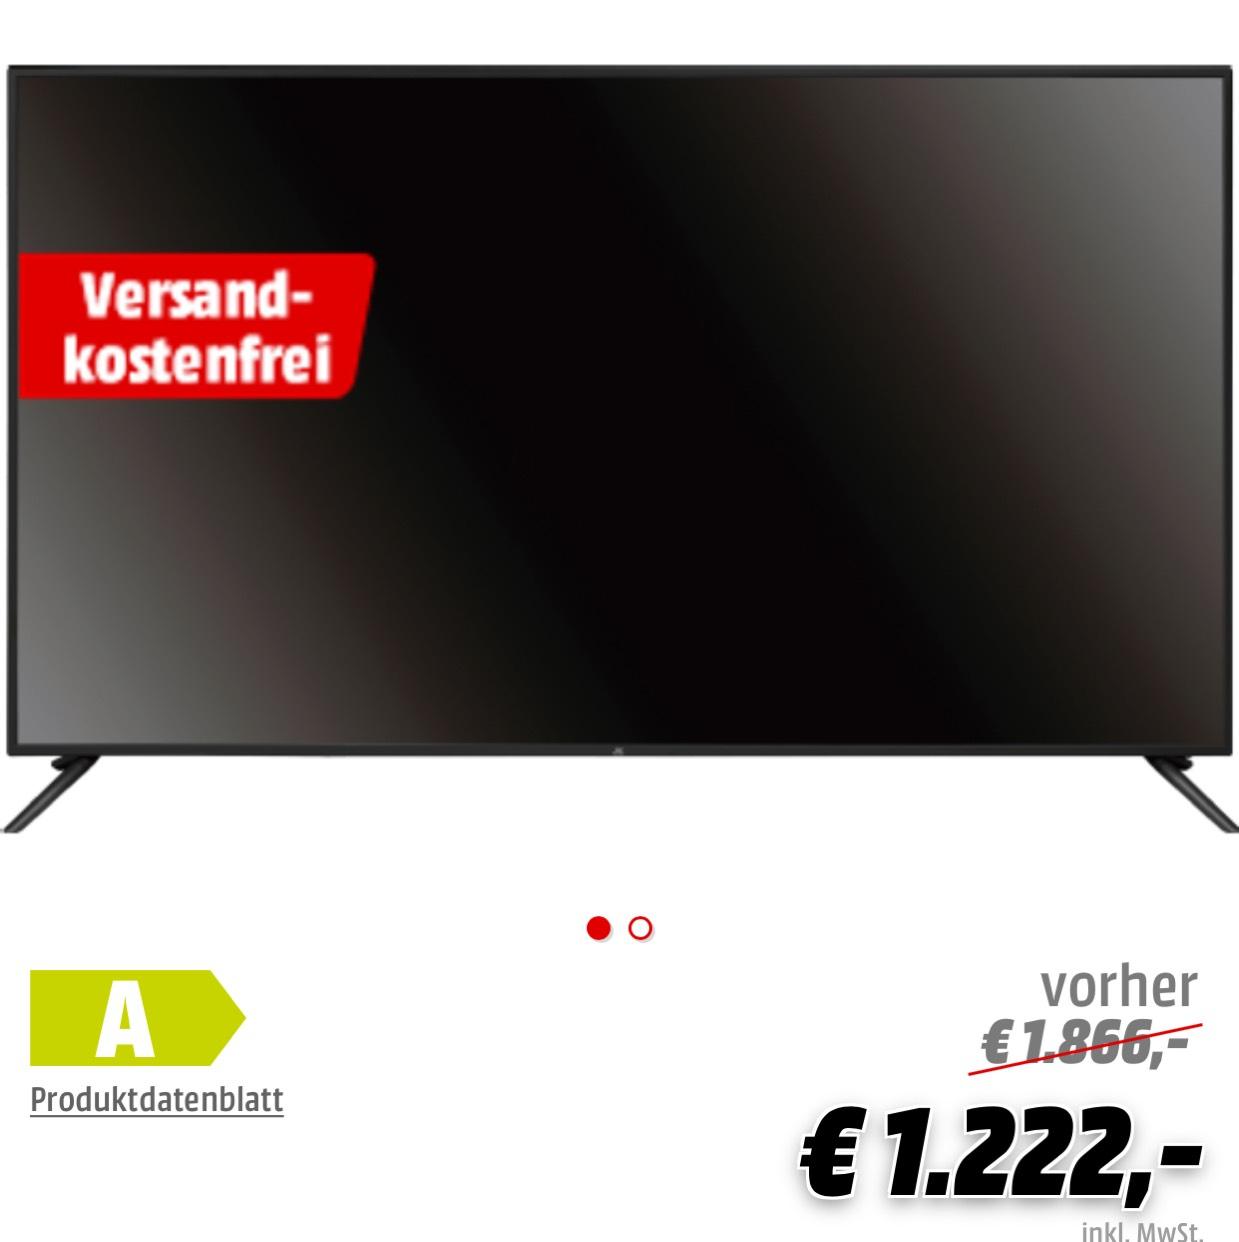 JAY-TECH GENESIS UHD 7.5 LED 75 Zoll !!! Media Markt Online